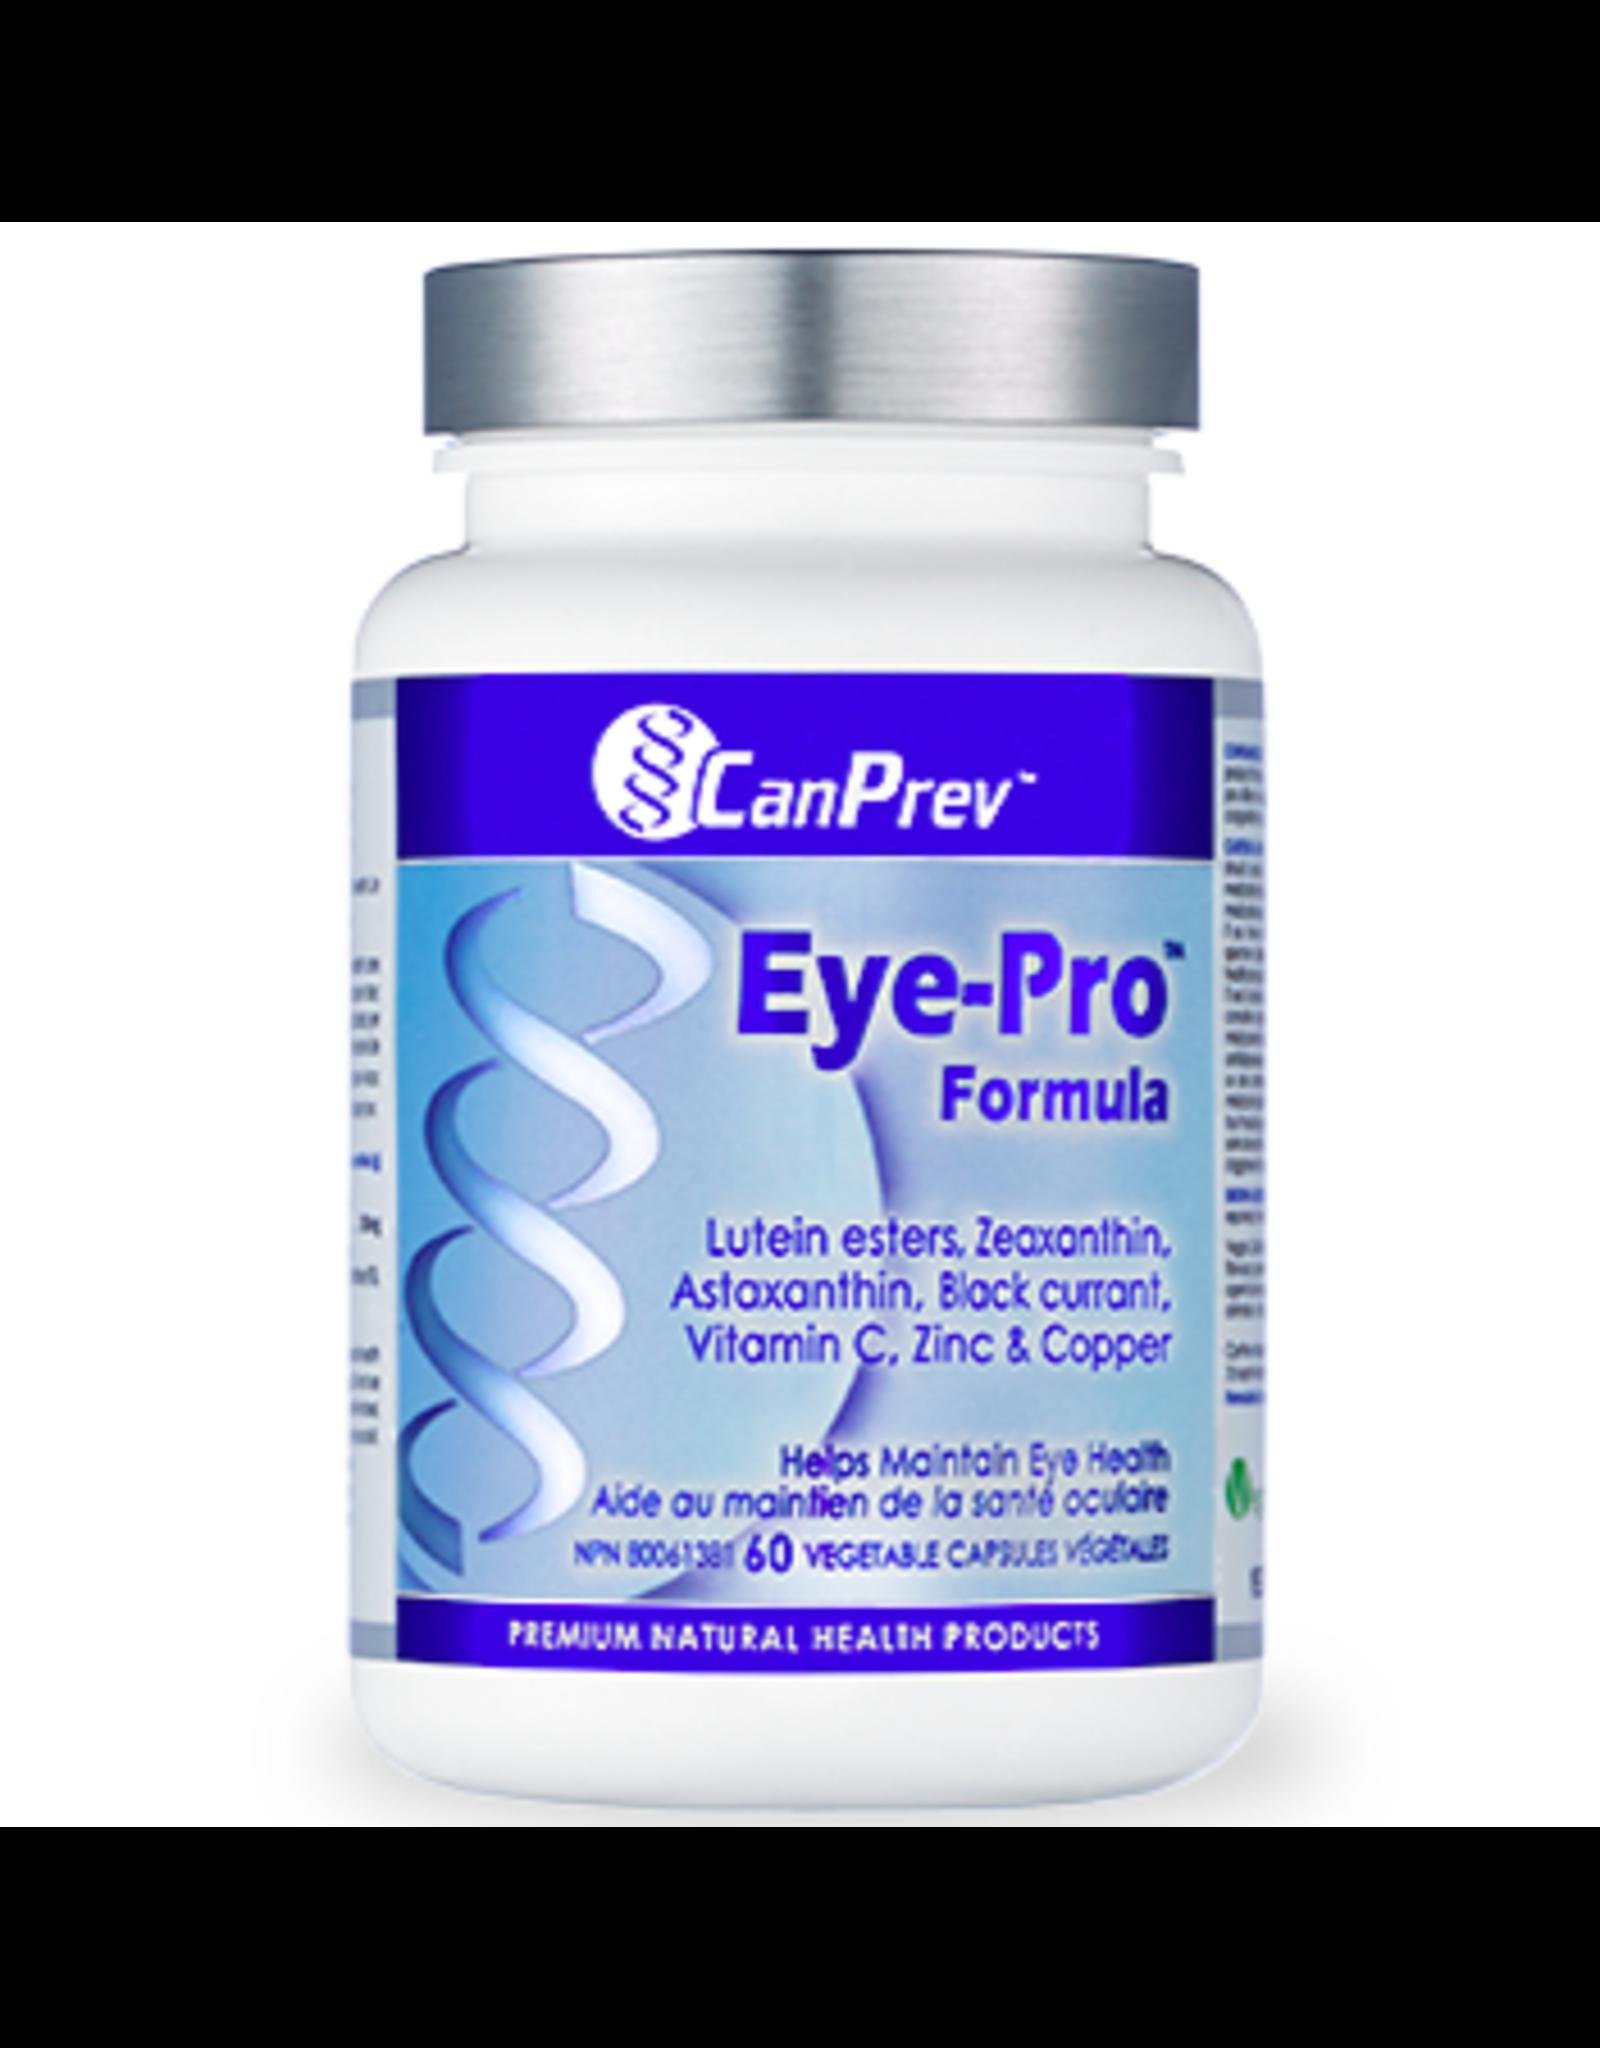 CanPrev Eye-Pro Formula